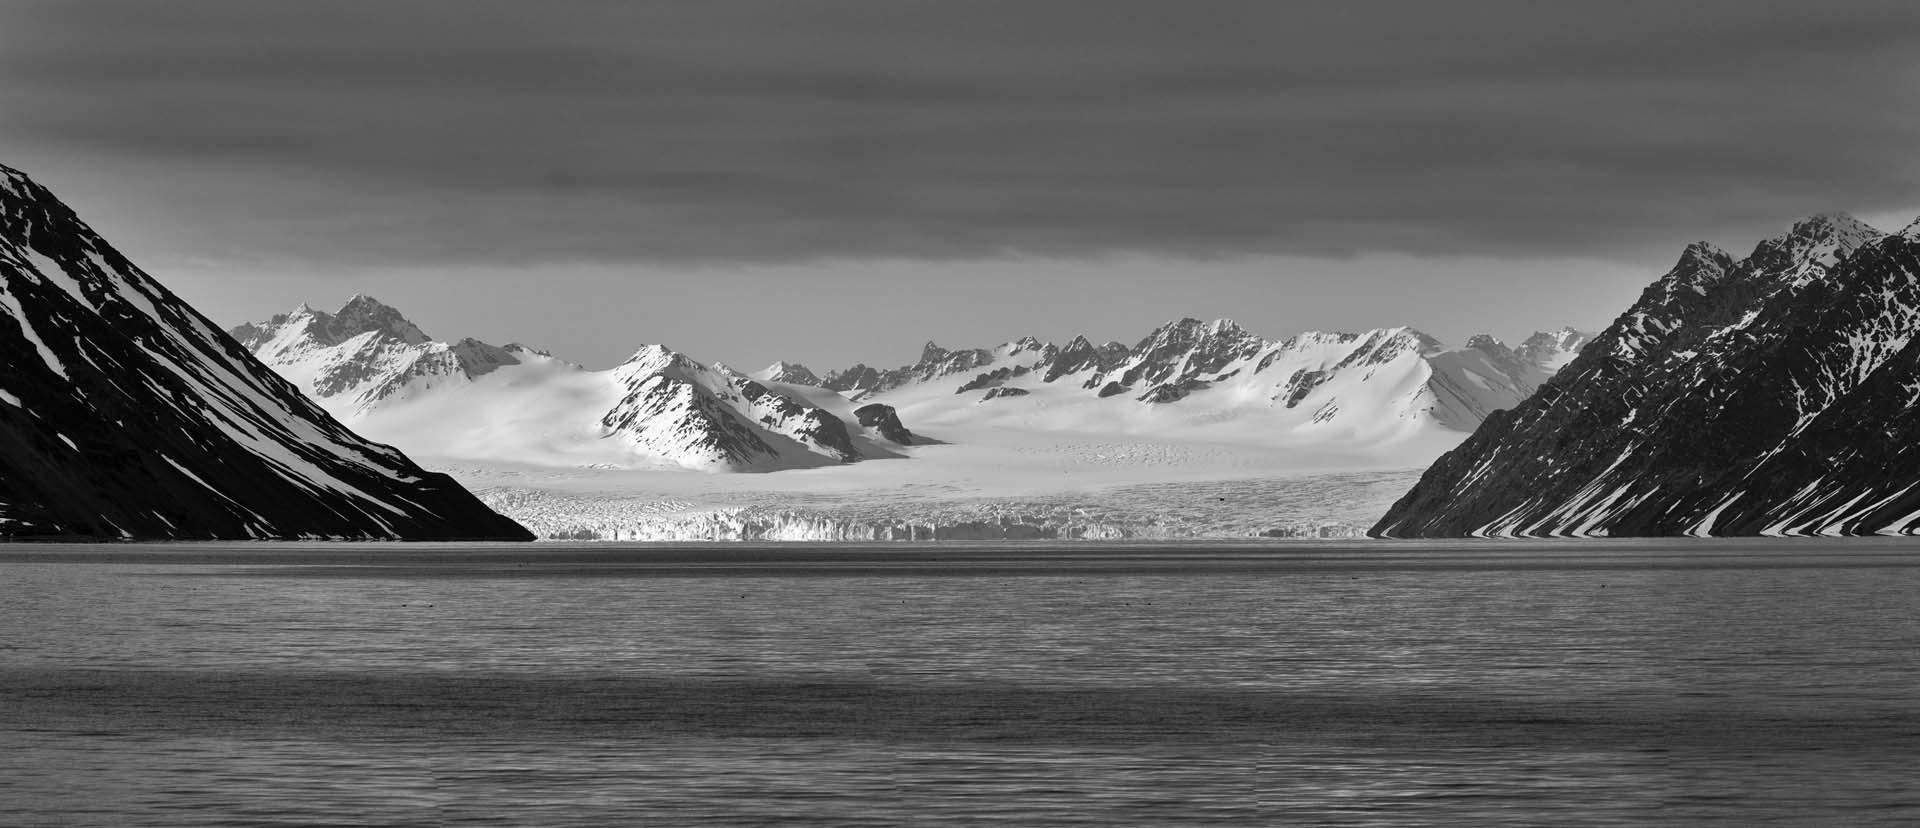 lilliehook_glacier_224a8328-224a8332_201